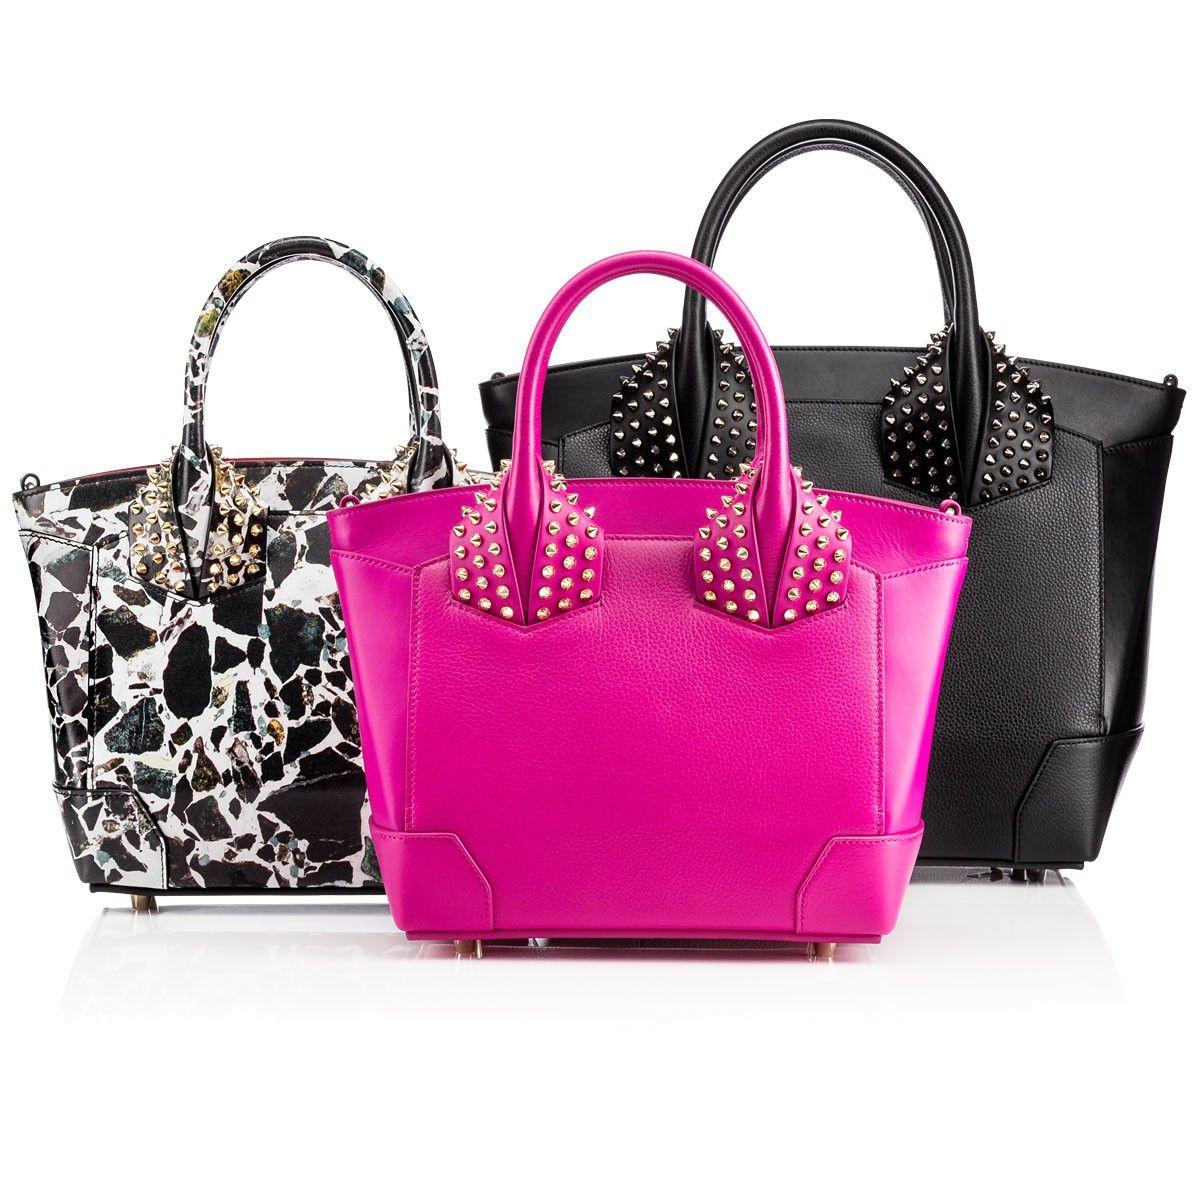 4858088205 Eloise small two handle bag Indian Rose/Indian Rose Calf - Handbags - Christian  Louboutin